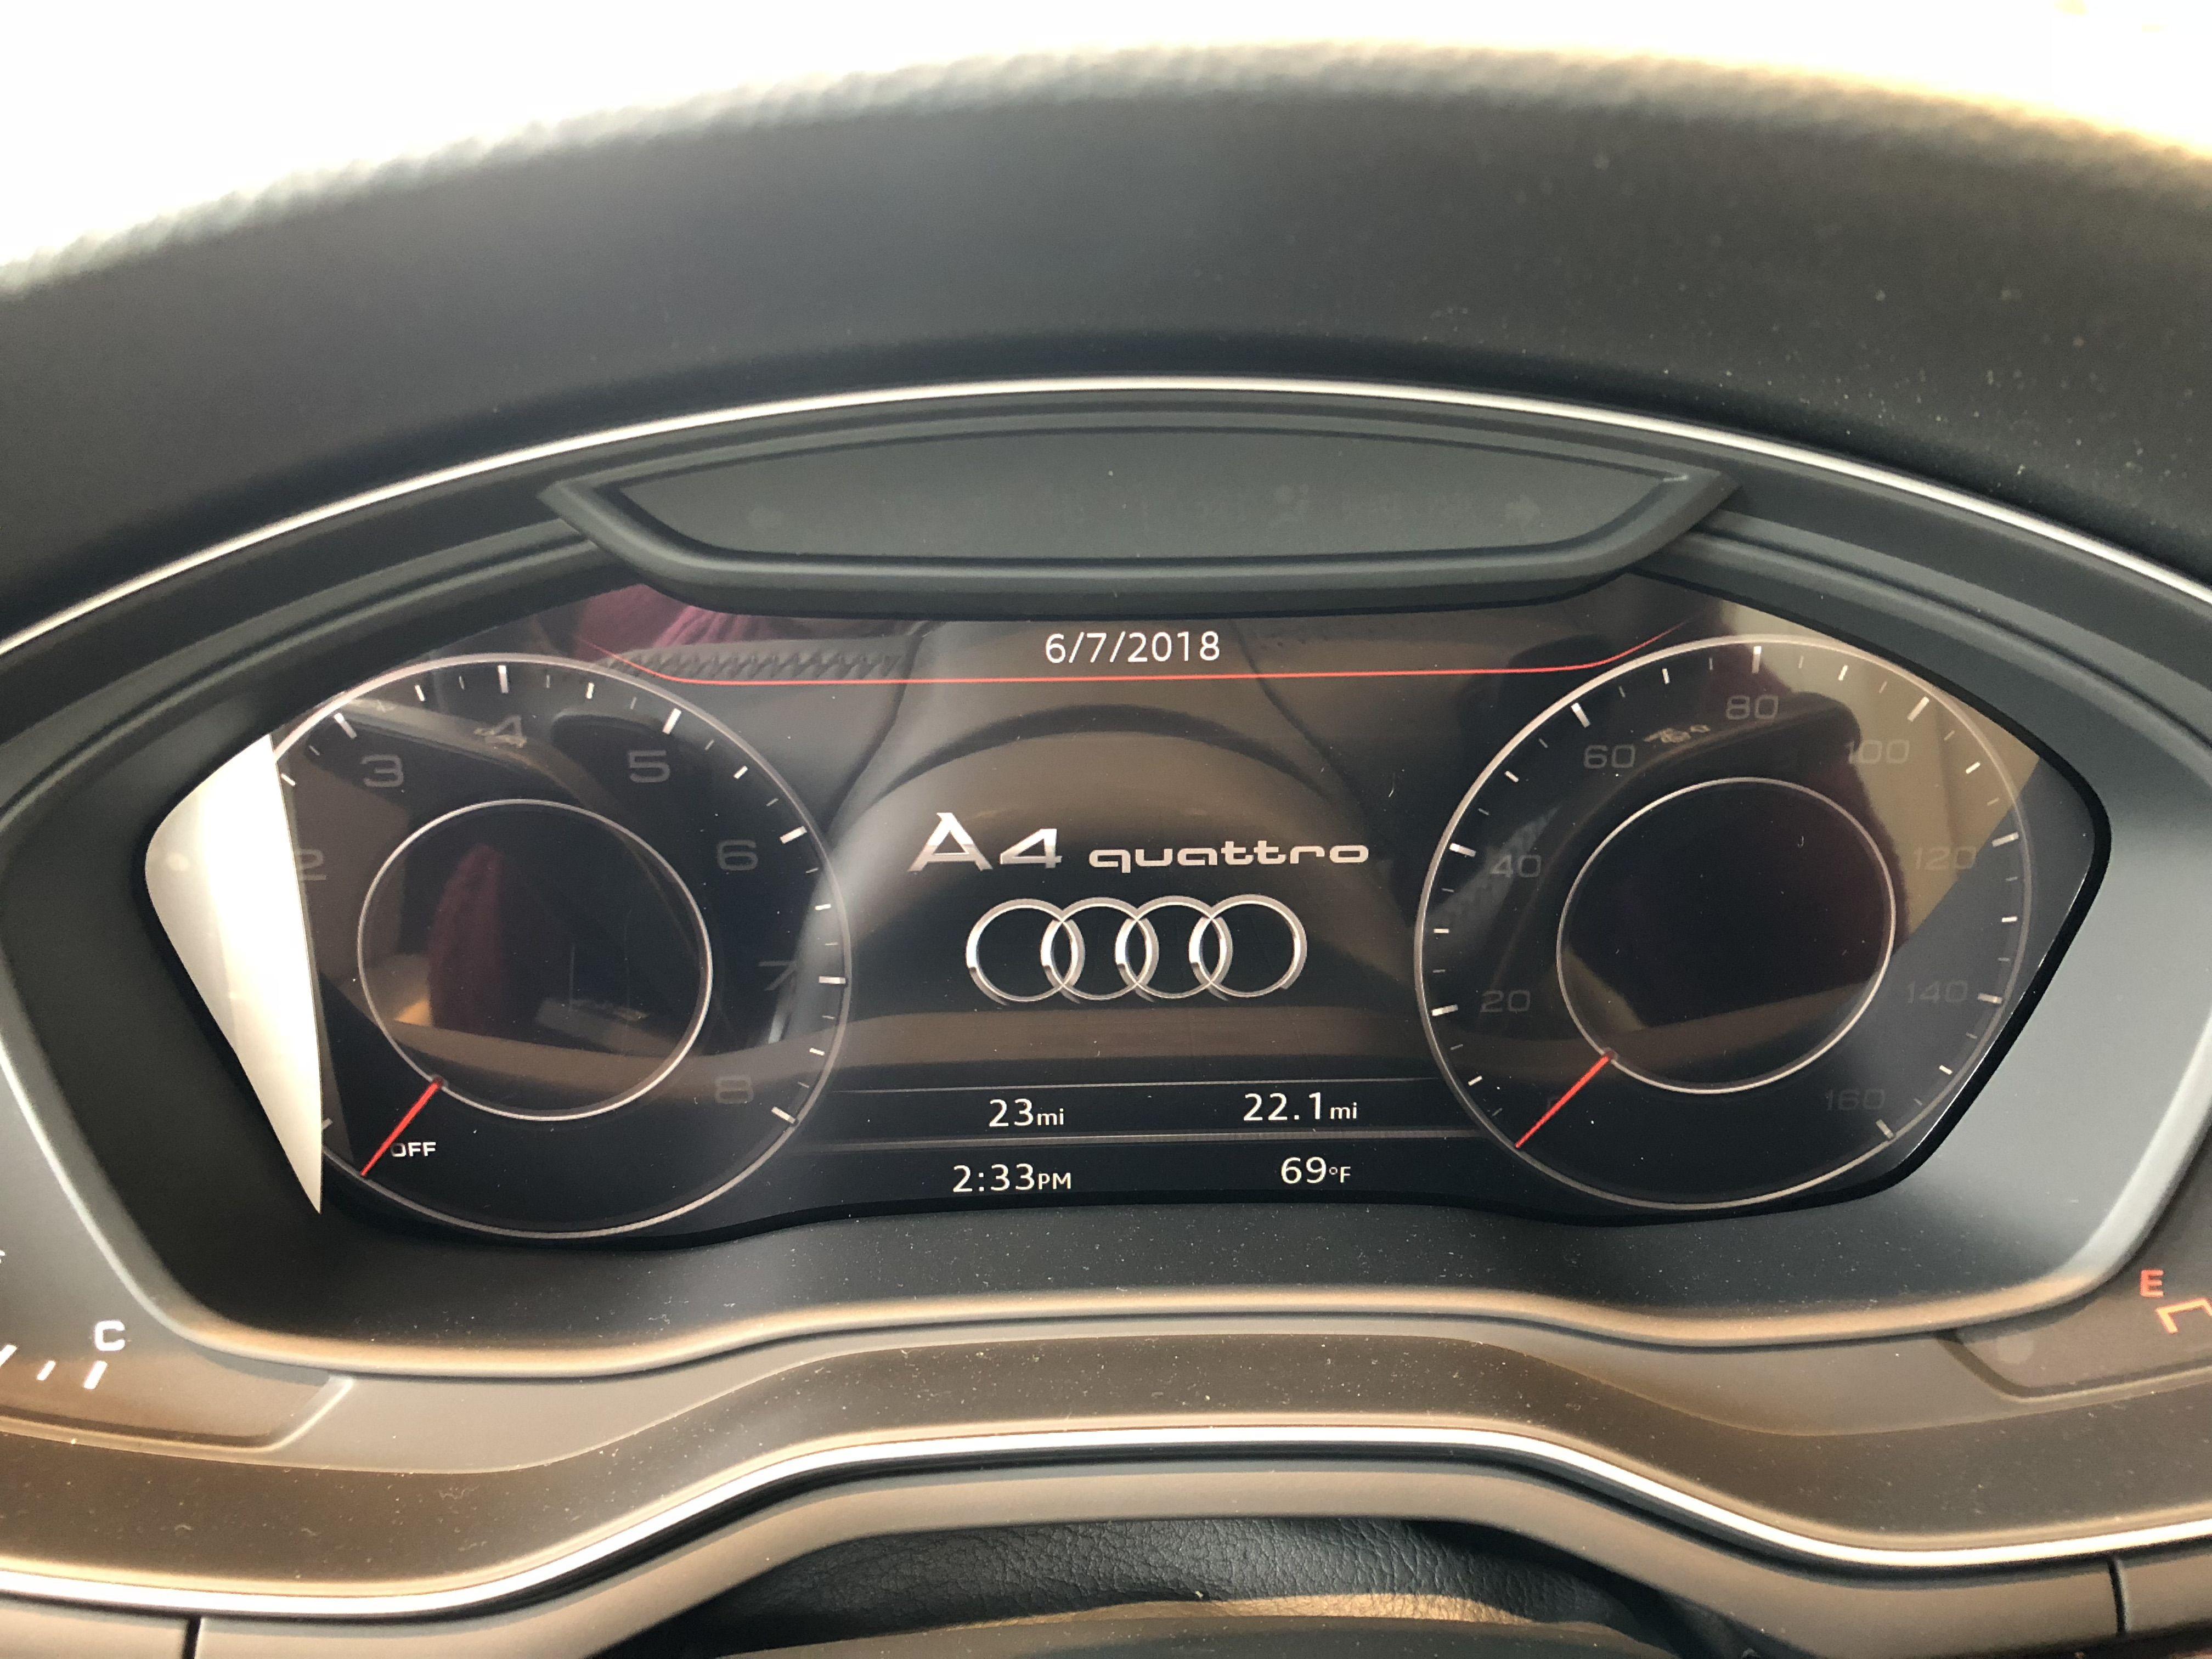 Virtual Dashboard Display On The 2018 Audi A4 Vehicle Located At Audi Of Bridgewater Nj Audi Audi Dealership Used Luxury Cars